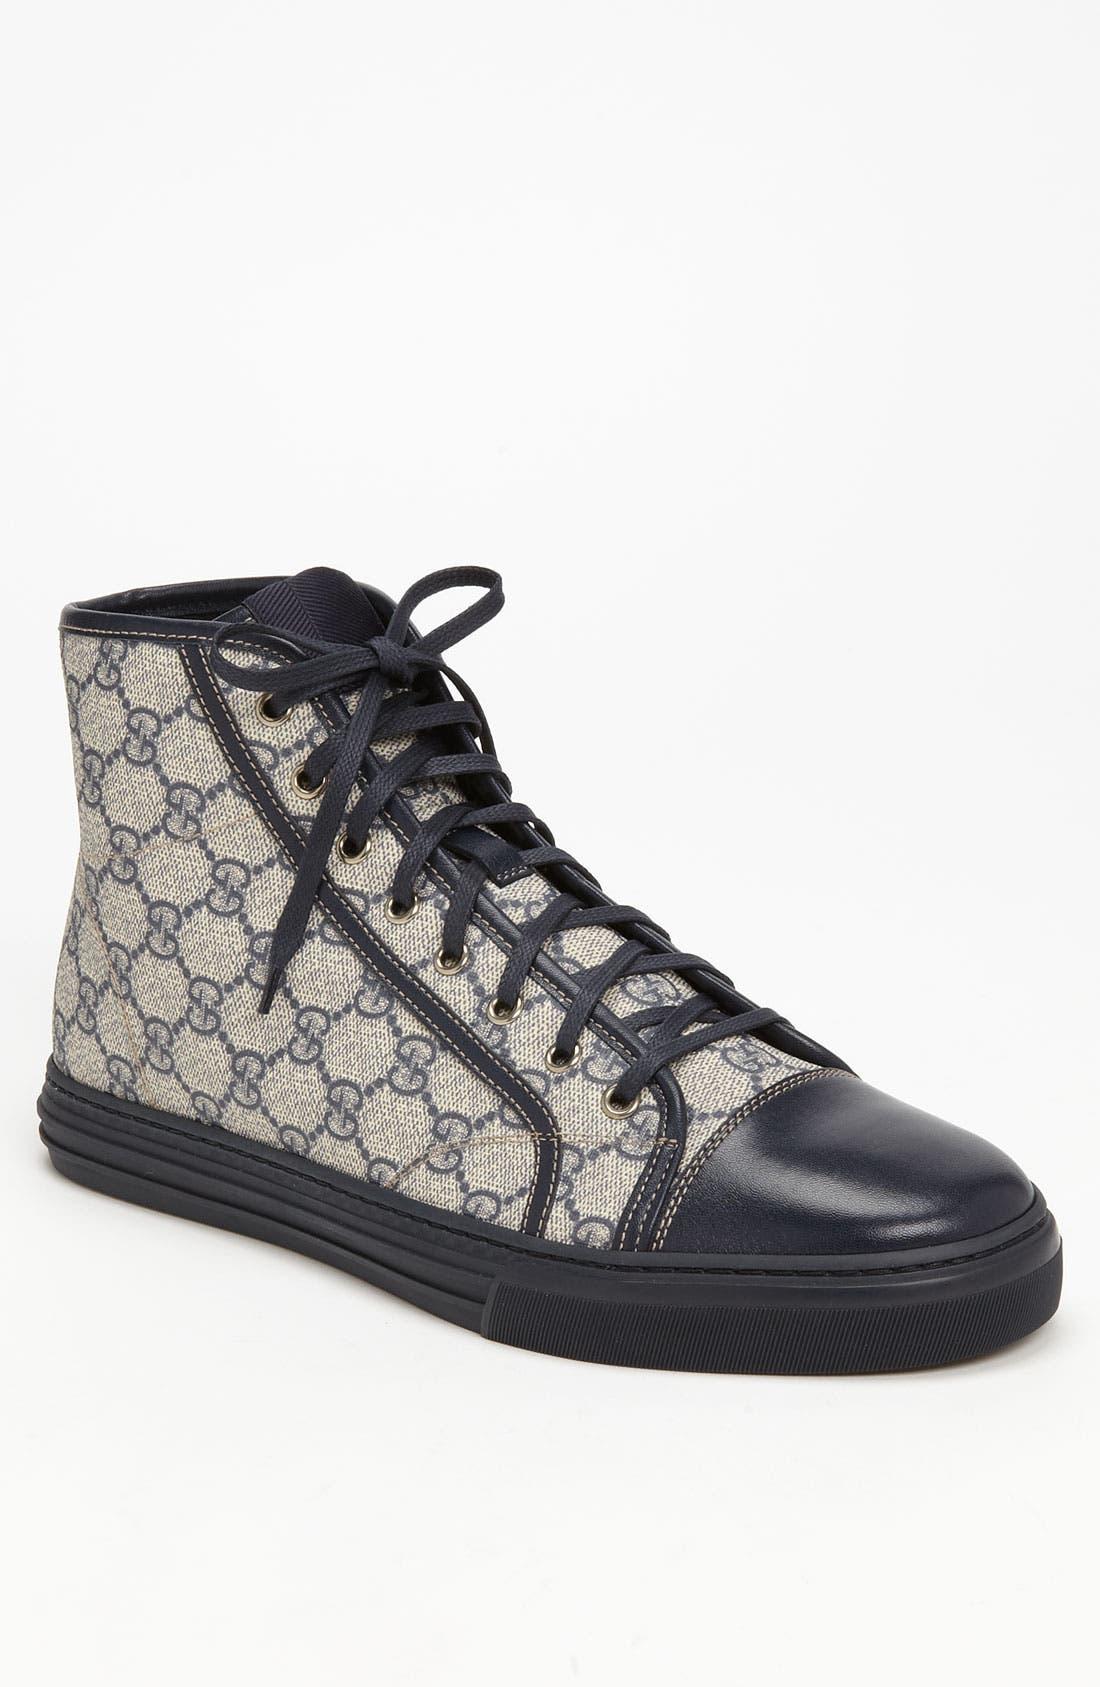 Main Image - Gucci 'California' High Top Sneaker